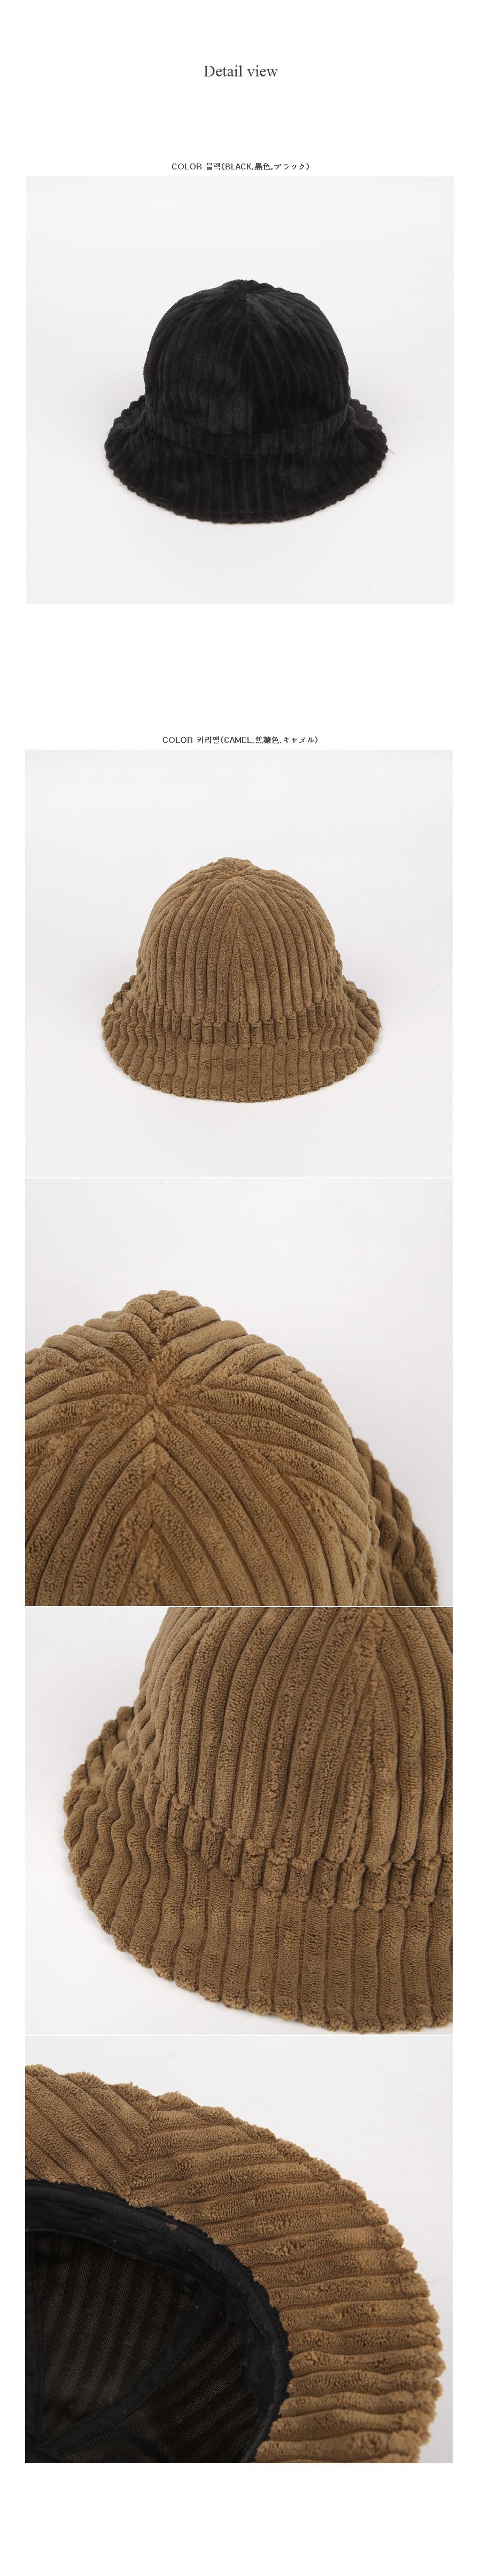 Cordou bungee hat